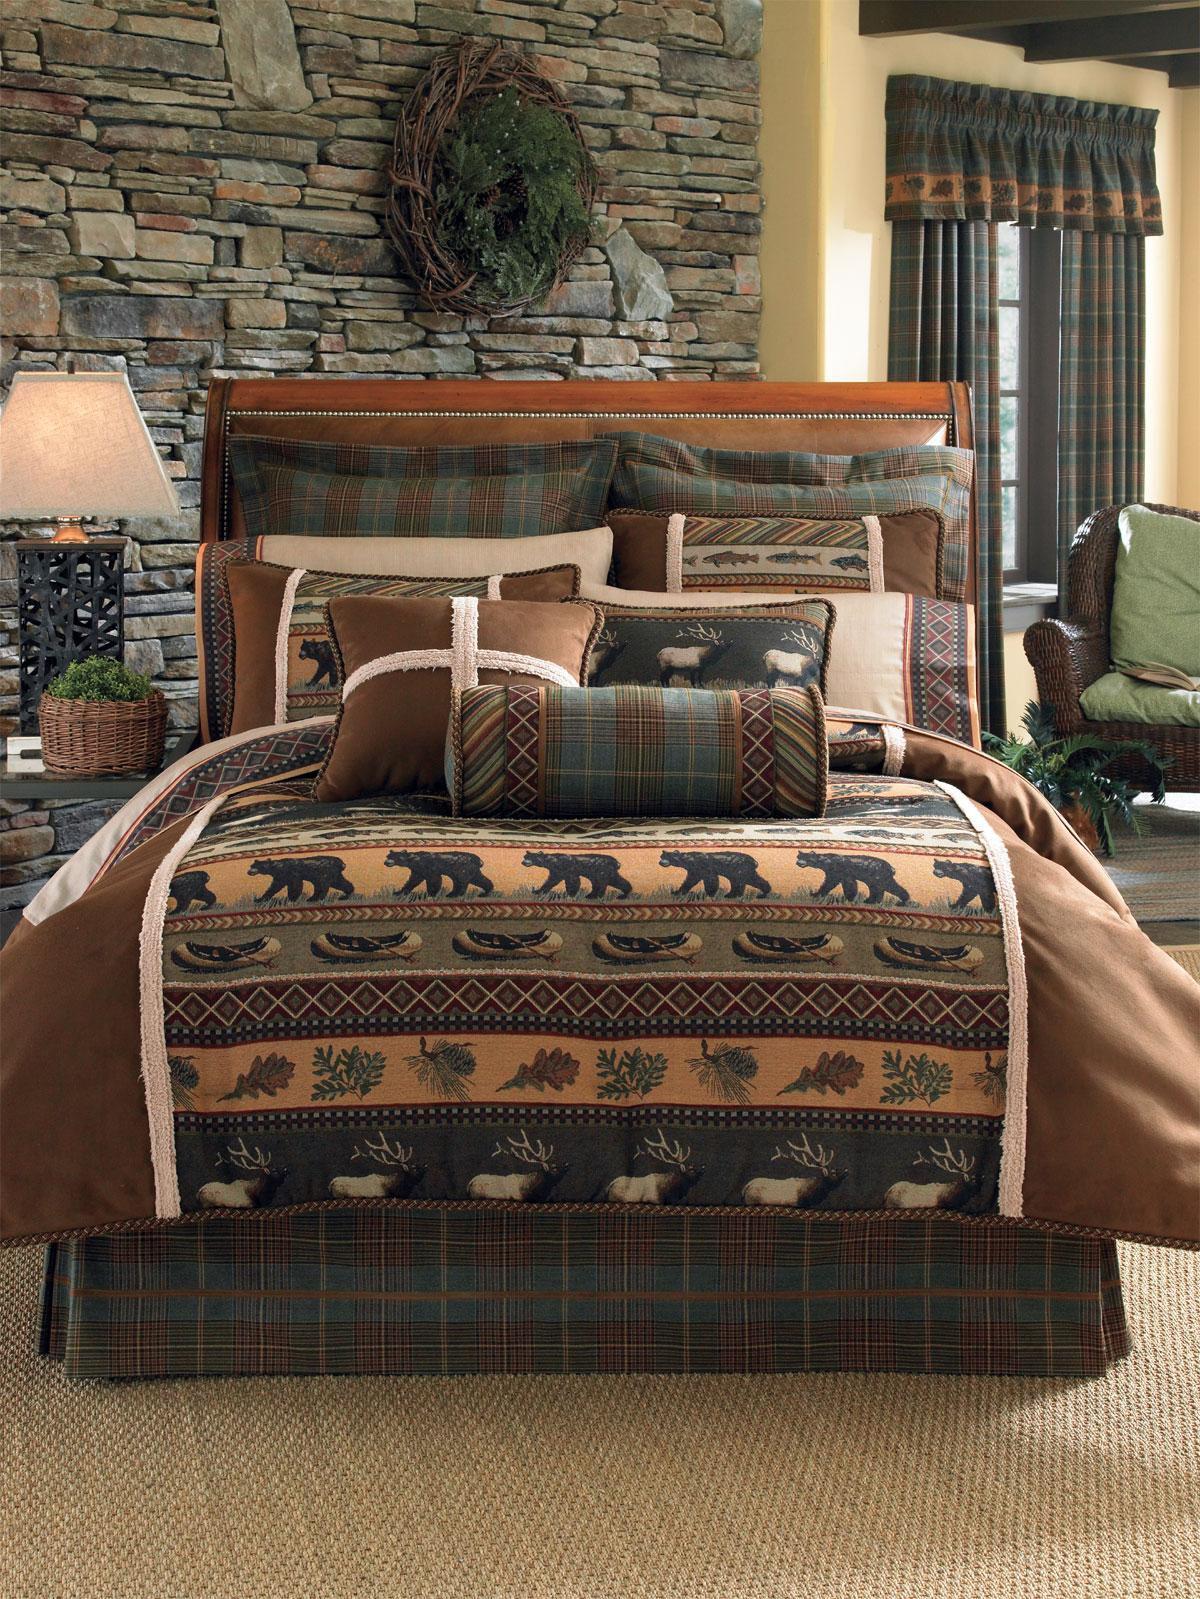 Caribou By Croscill Home Fashions Beddingsuperstore Com